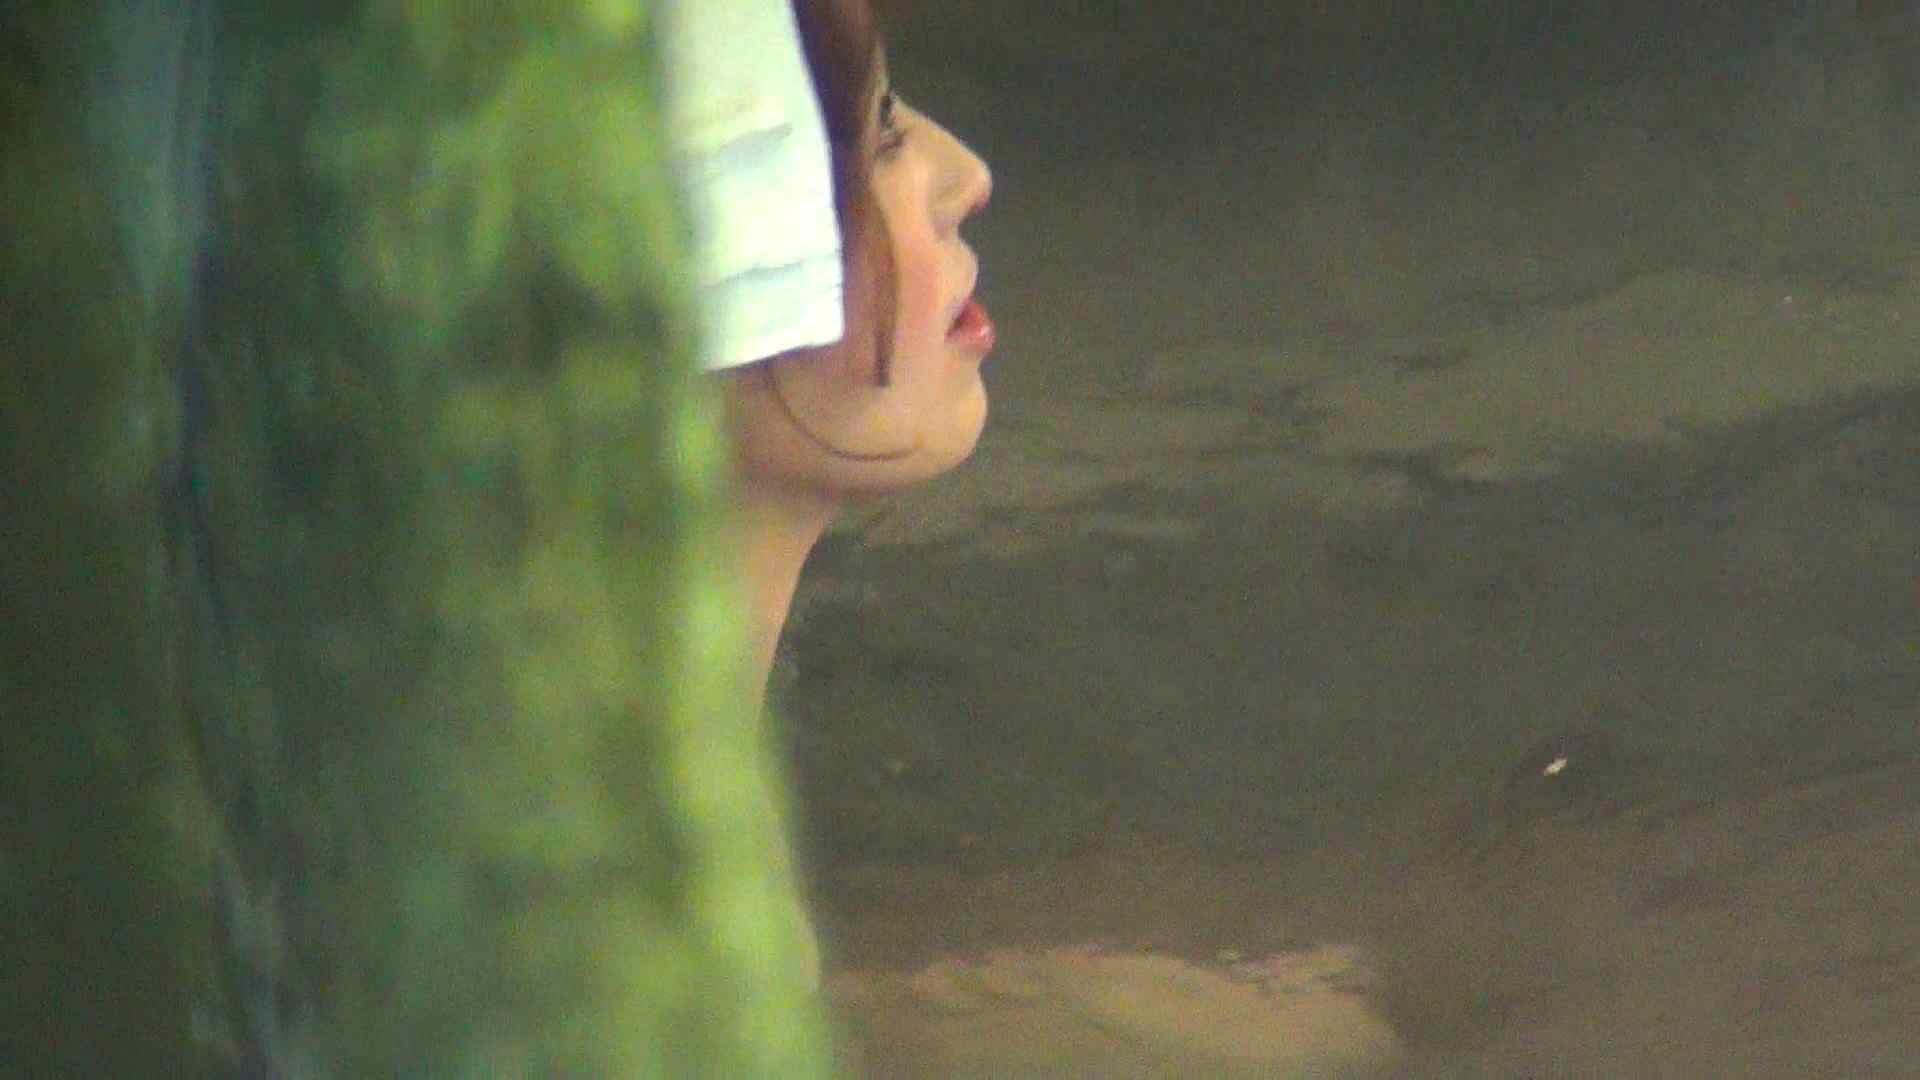 Aquaな露天風呂Vol.272 露天風呂 | OLのエロ生活  52連発 31